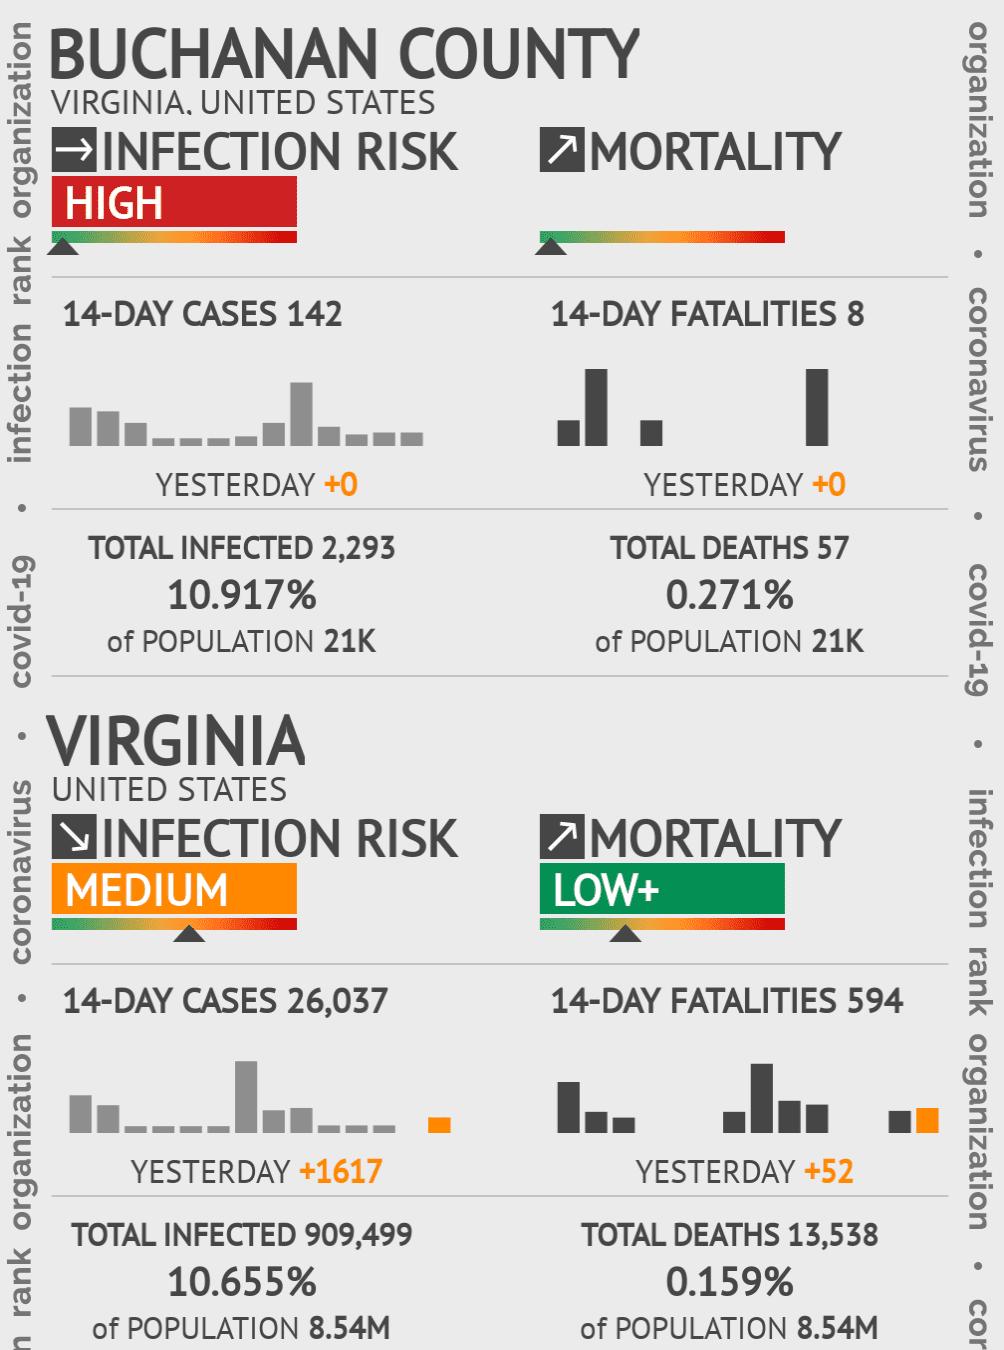 Buchanan County Coronavirus Covid-19 Risk of Infection on July 24, 2021